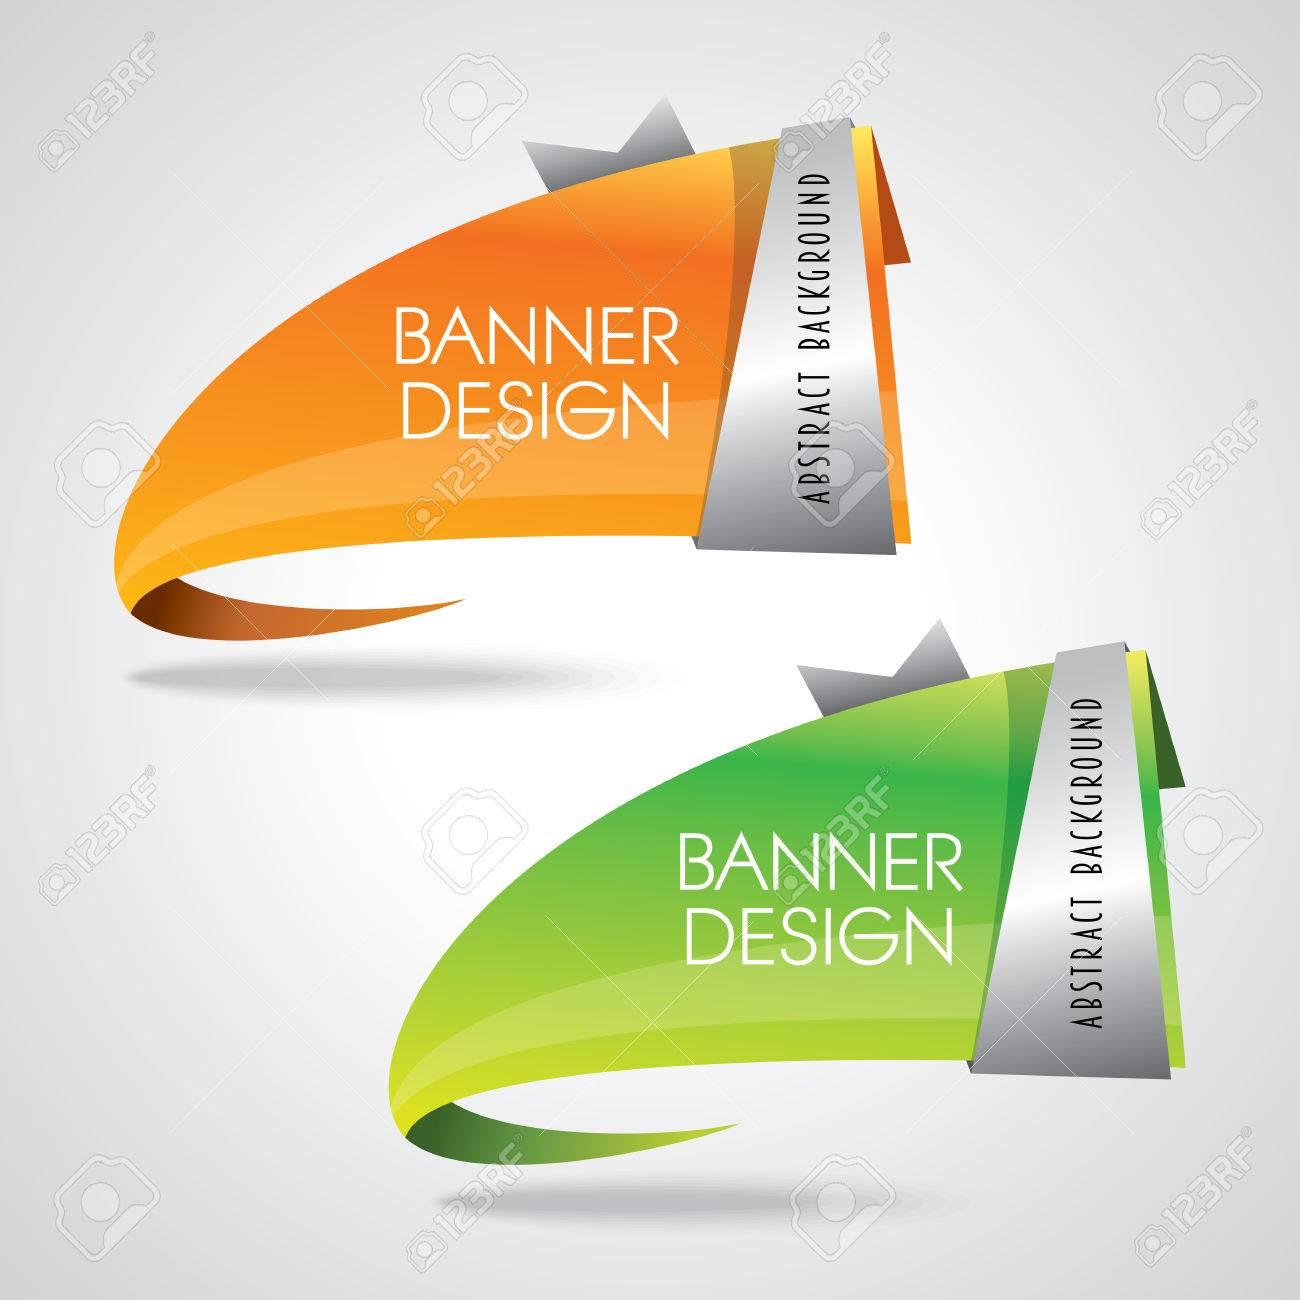 Colorful promotional banner design vector illustration - 41602660